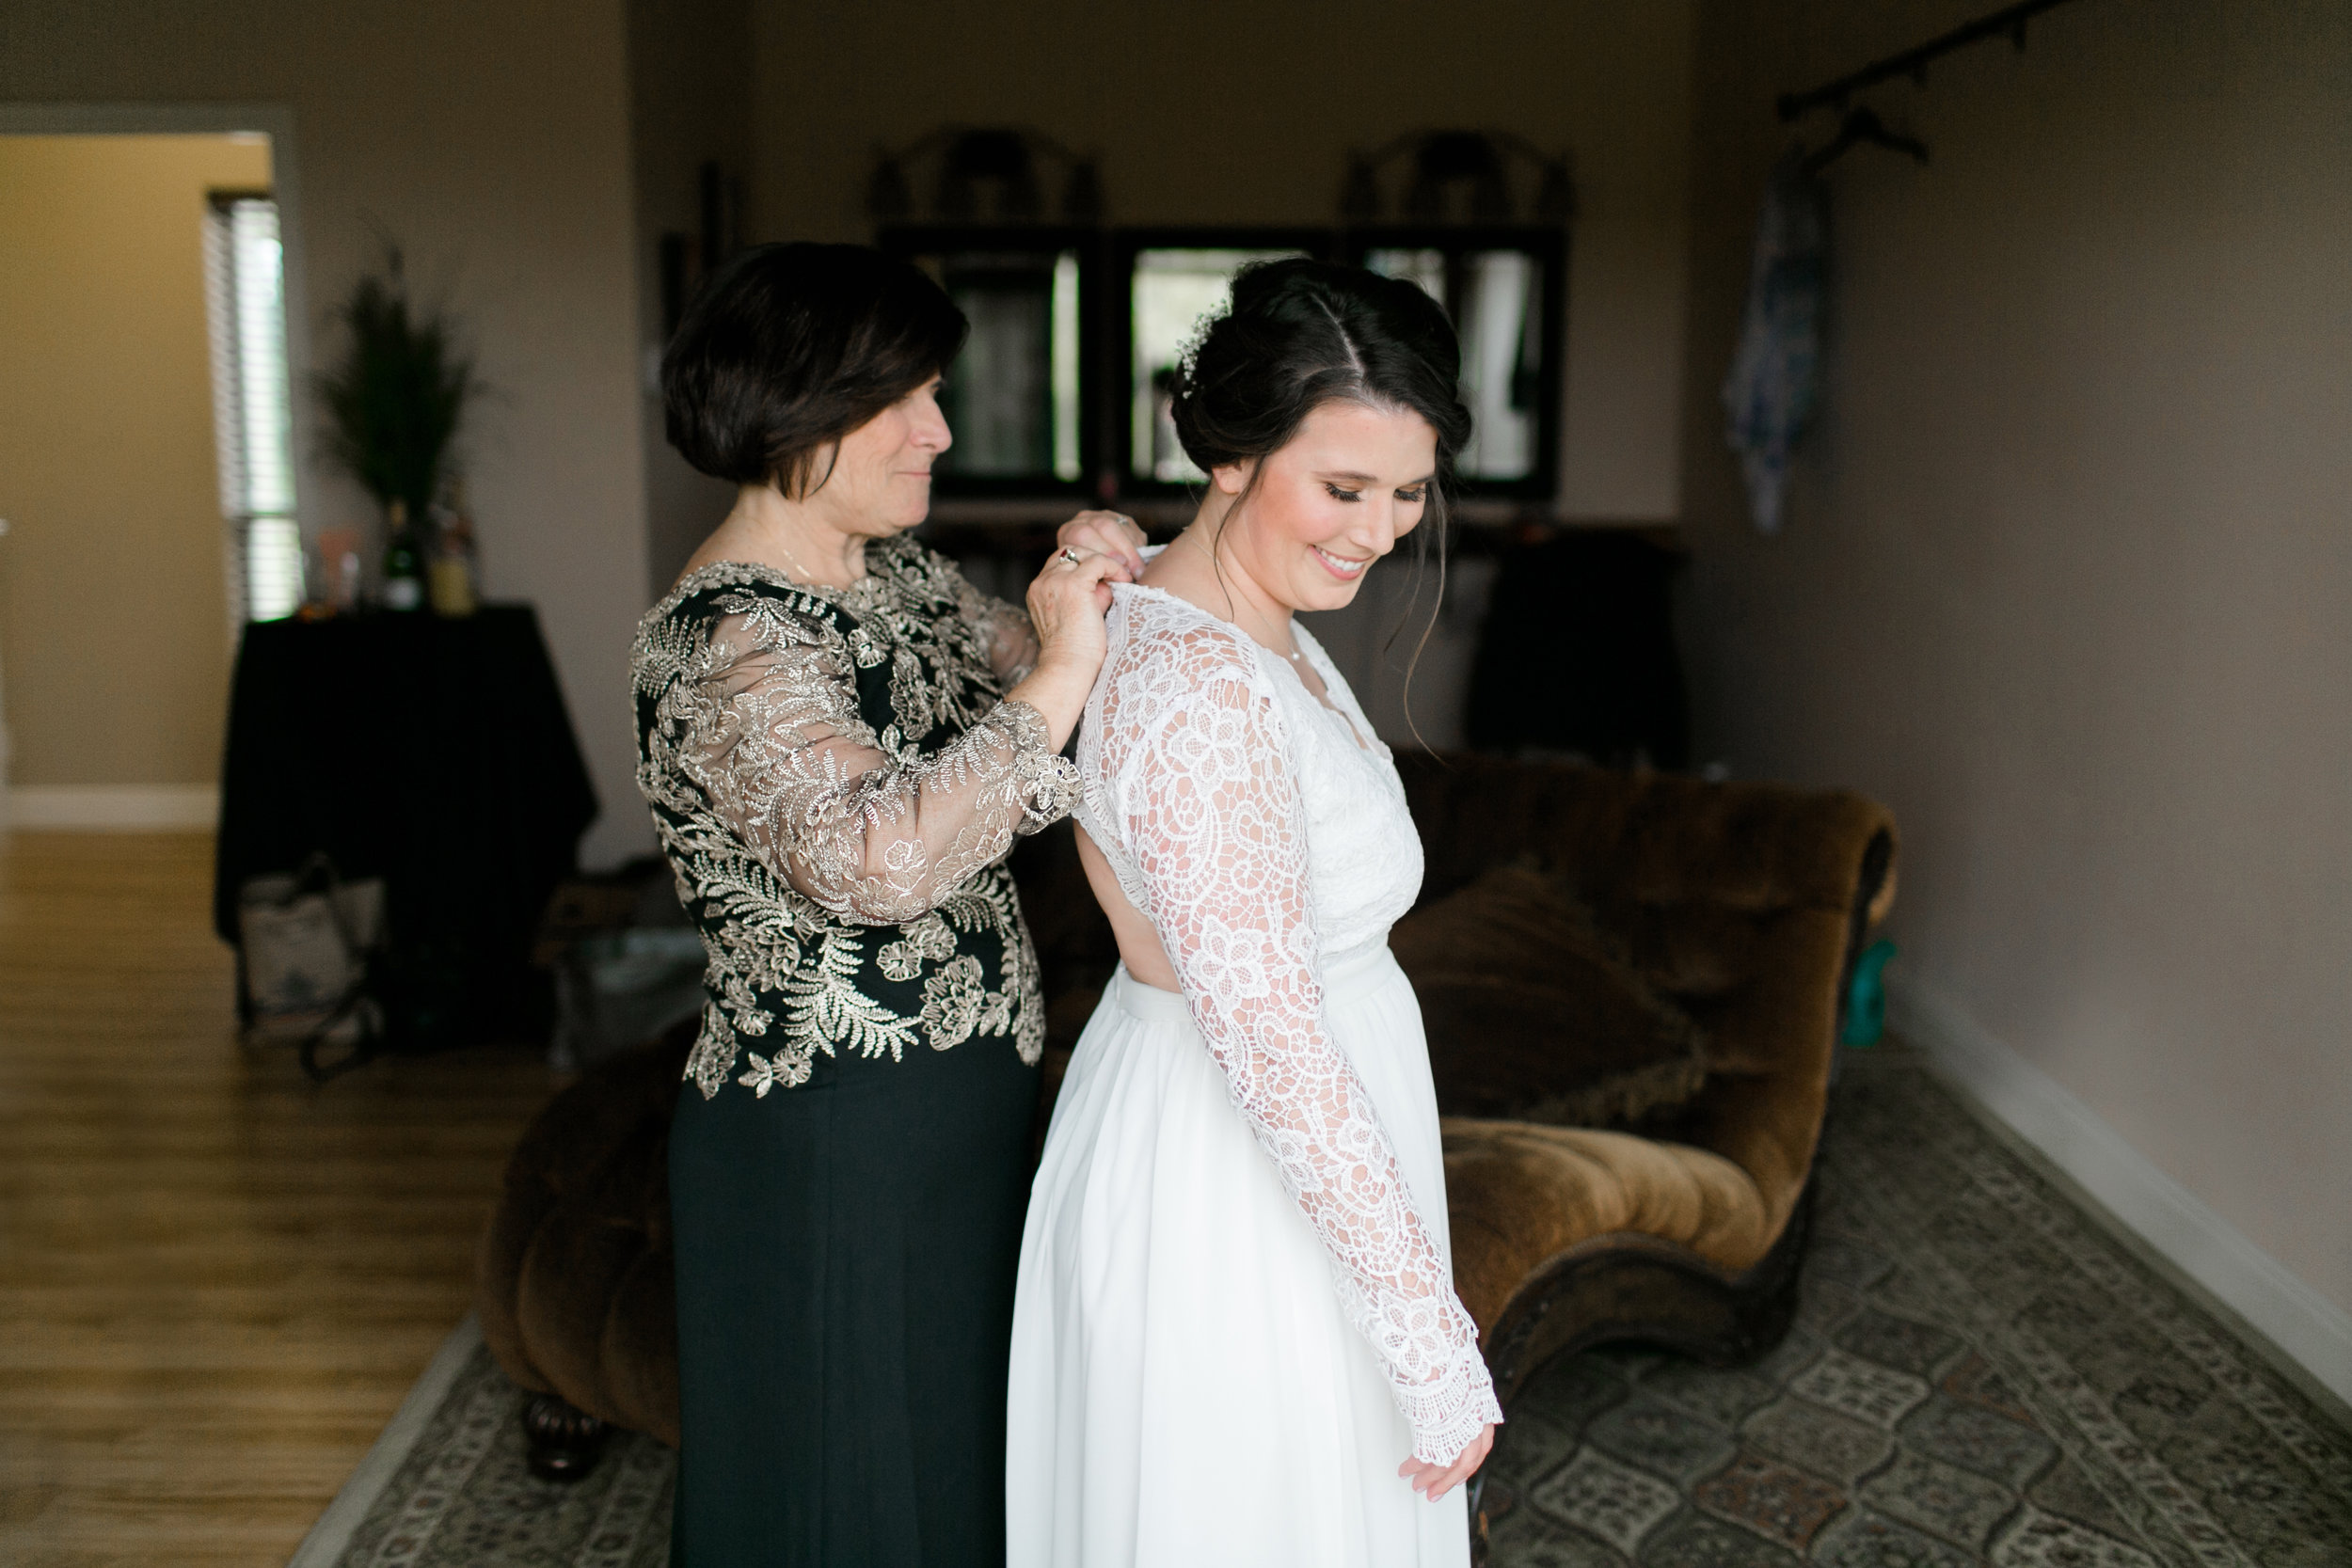 Austin_Texas_Fine_Art_Wedding_Photographer_Kayla_Snell_Photography_Antebellum_Oaks116.jpg